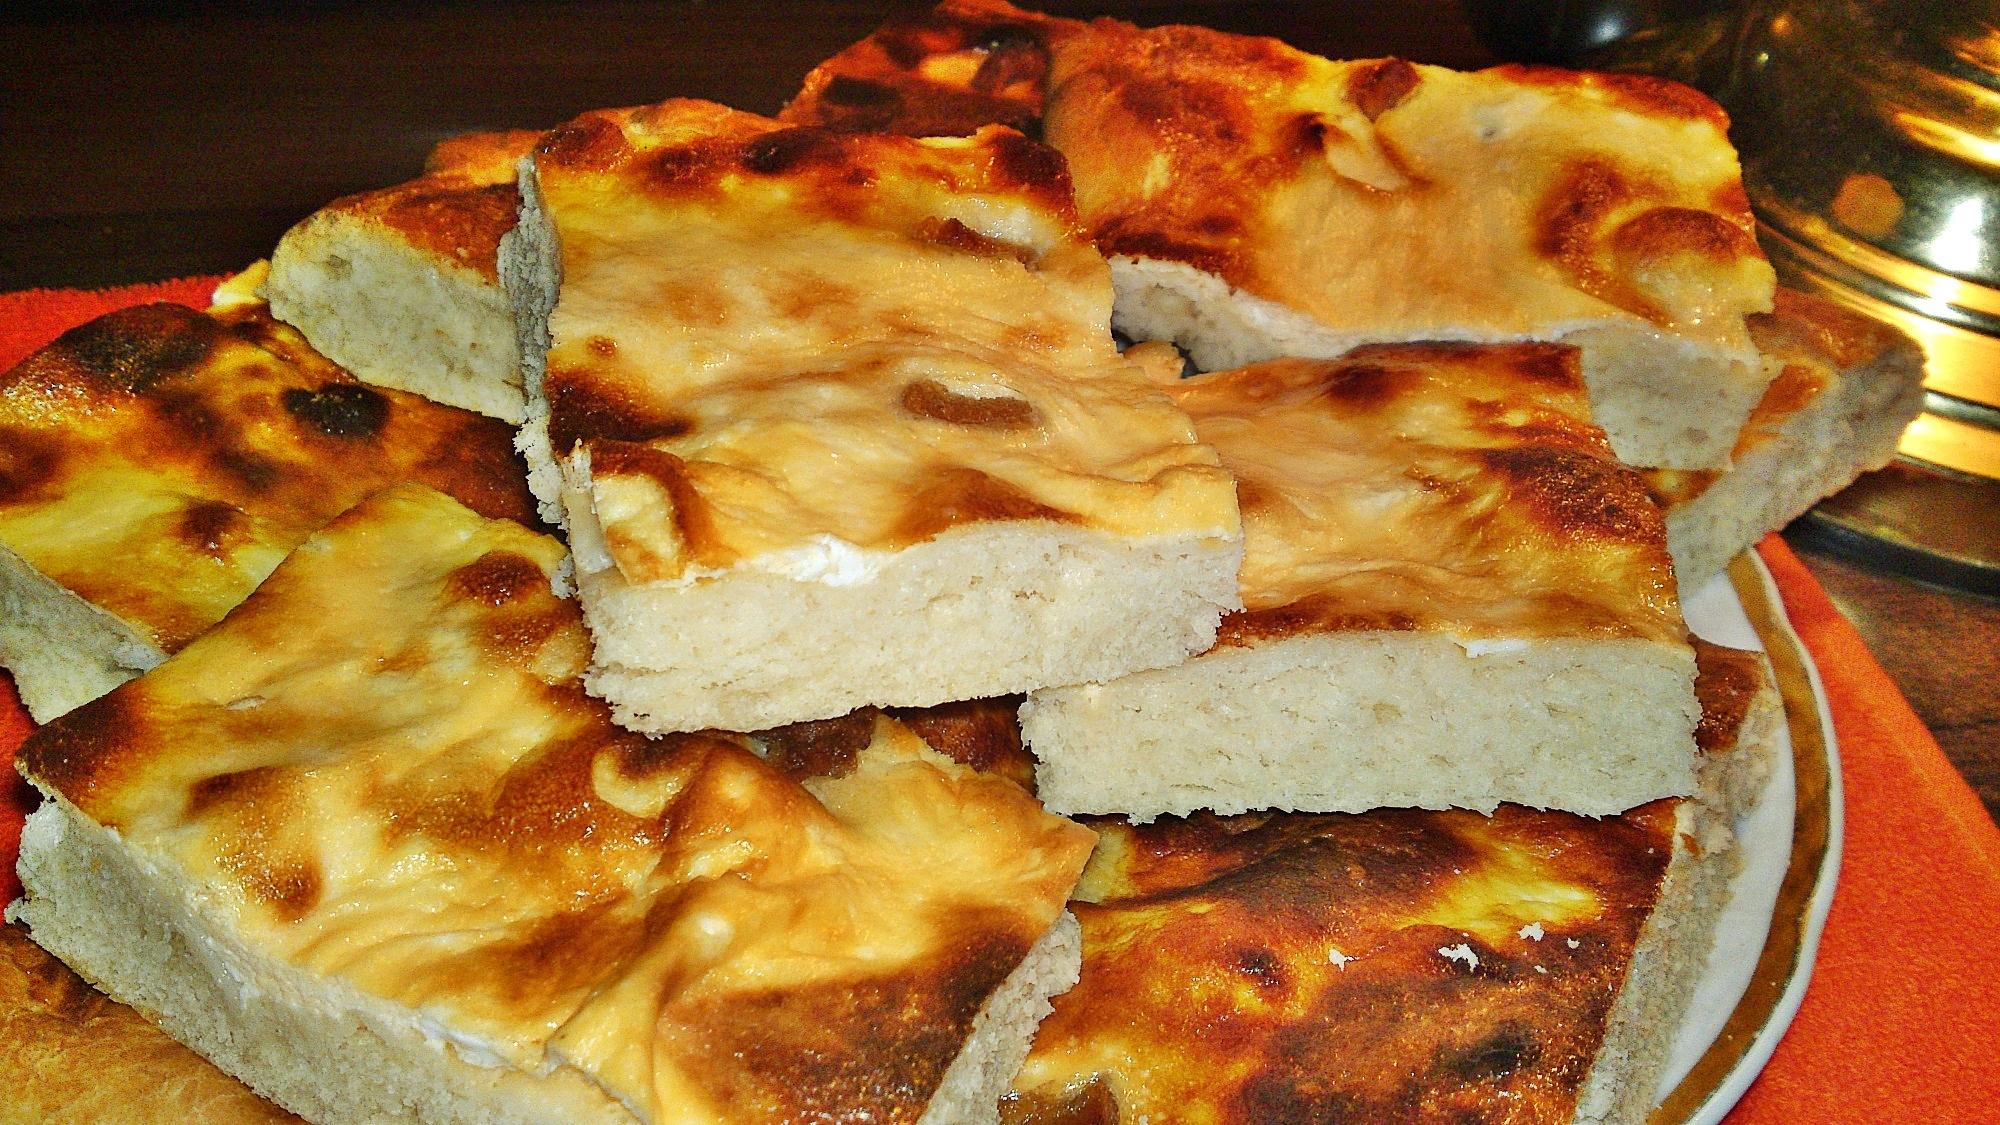 Smetanový koláč s domácími škvarky